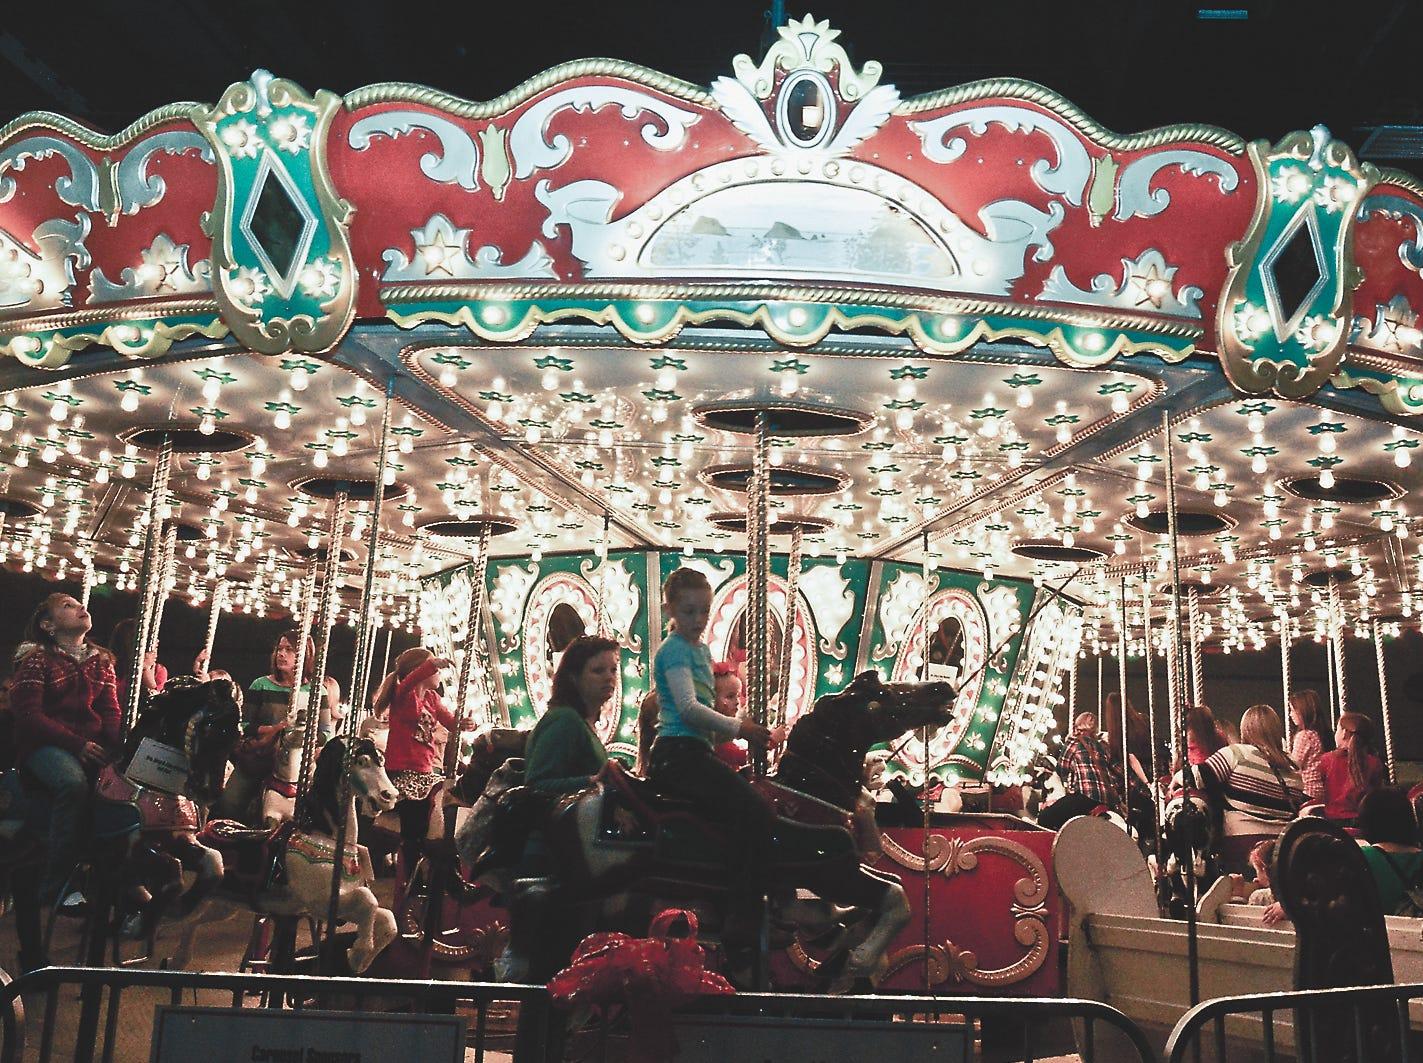 Guests at Fantasy of Trees ride the carousel, November, 2012.